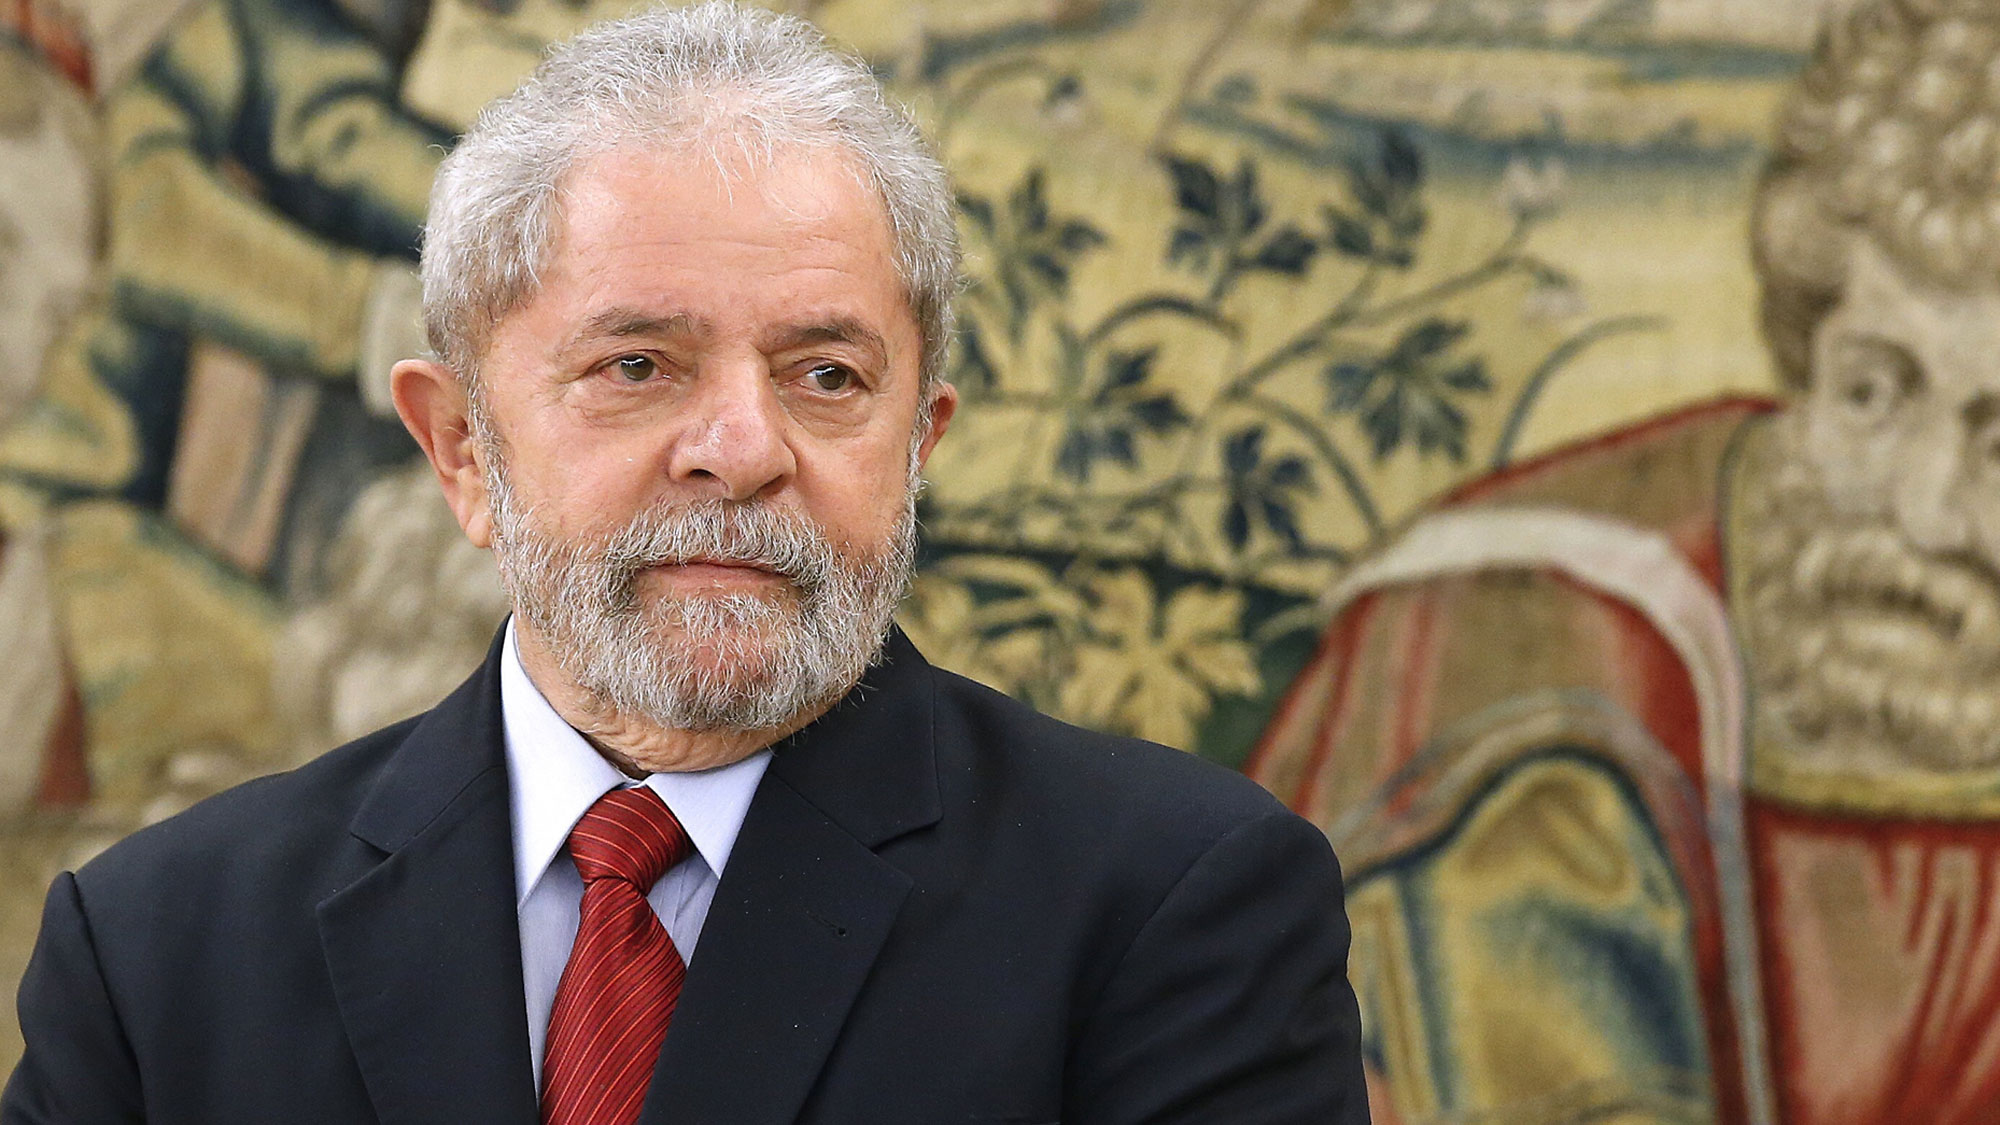 Лулу да Силва - потенциальный лидер президентской гонки